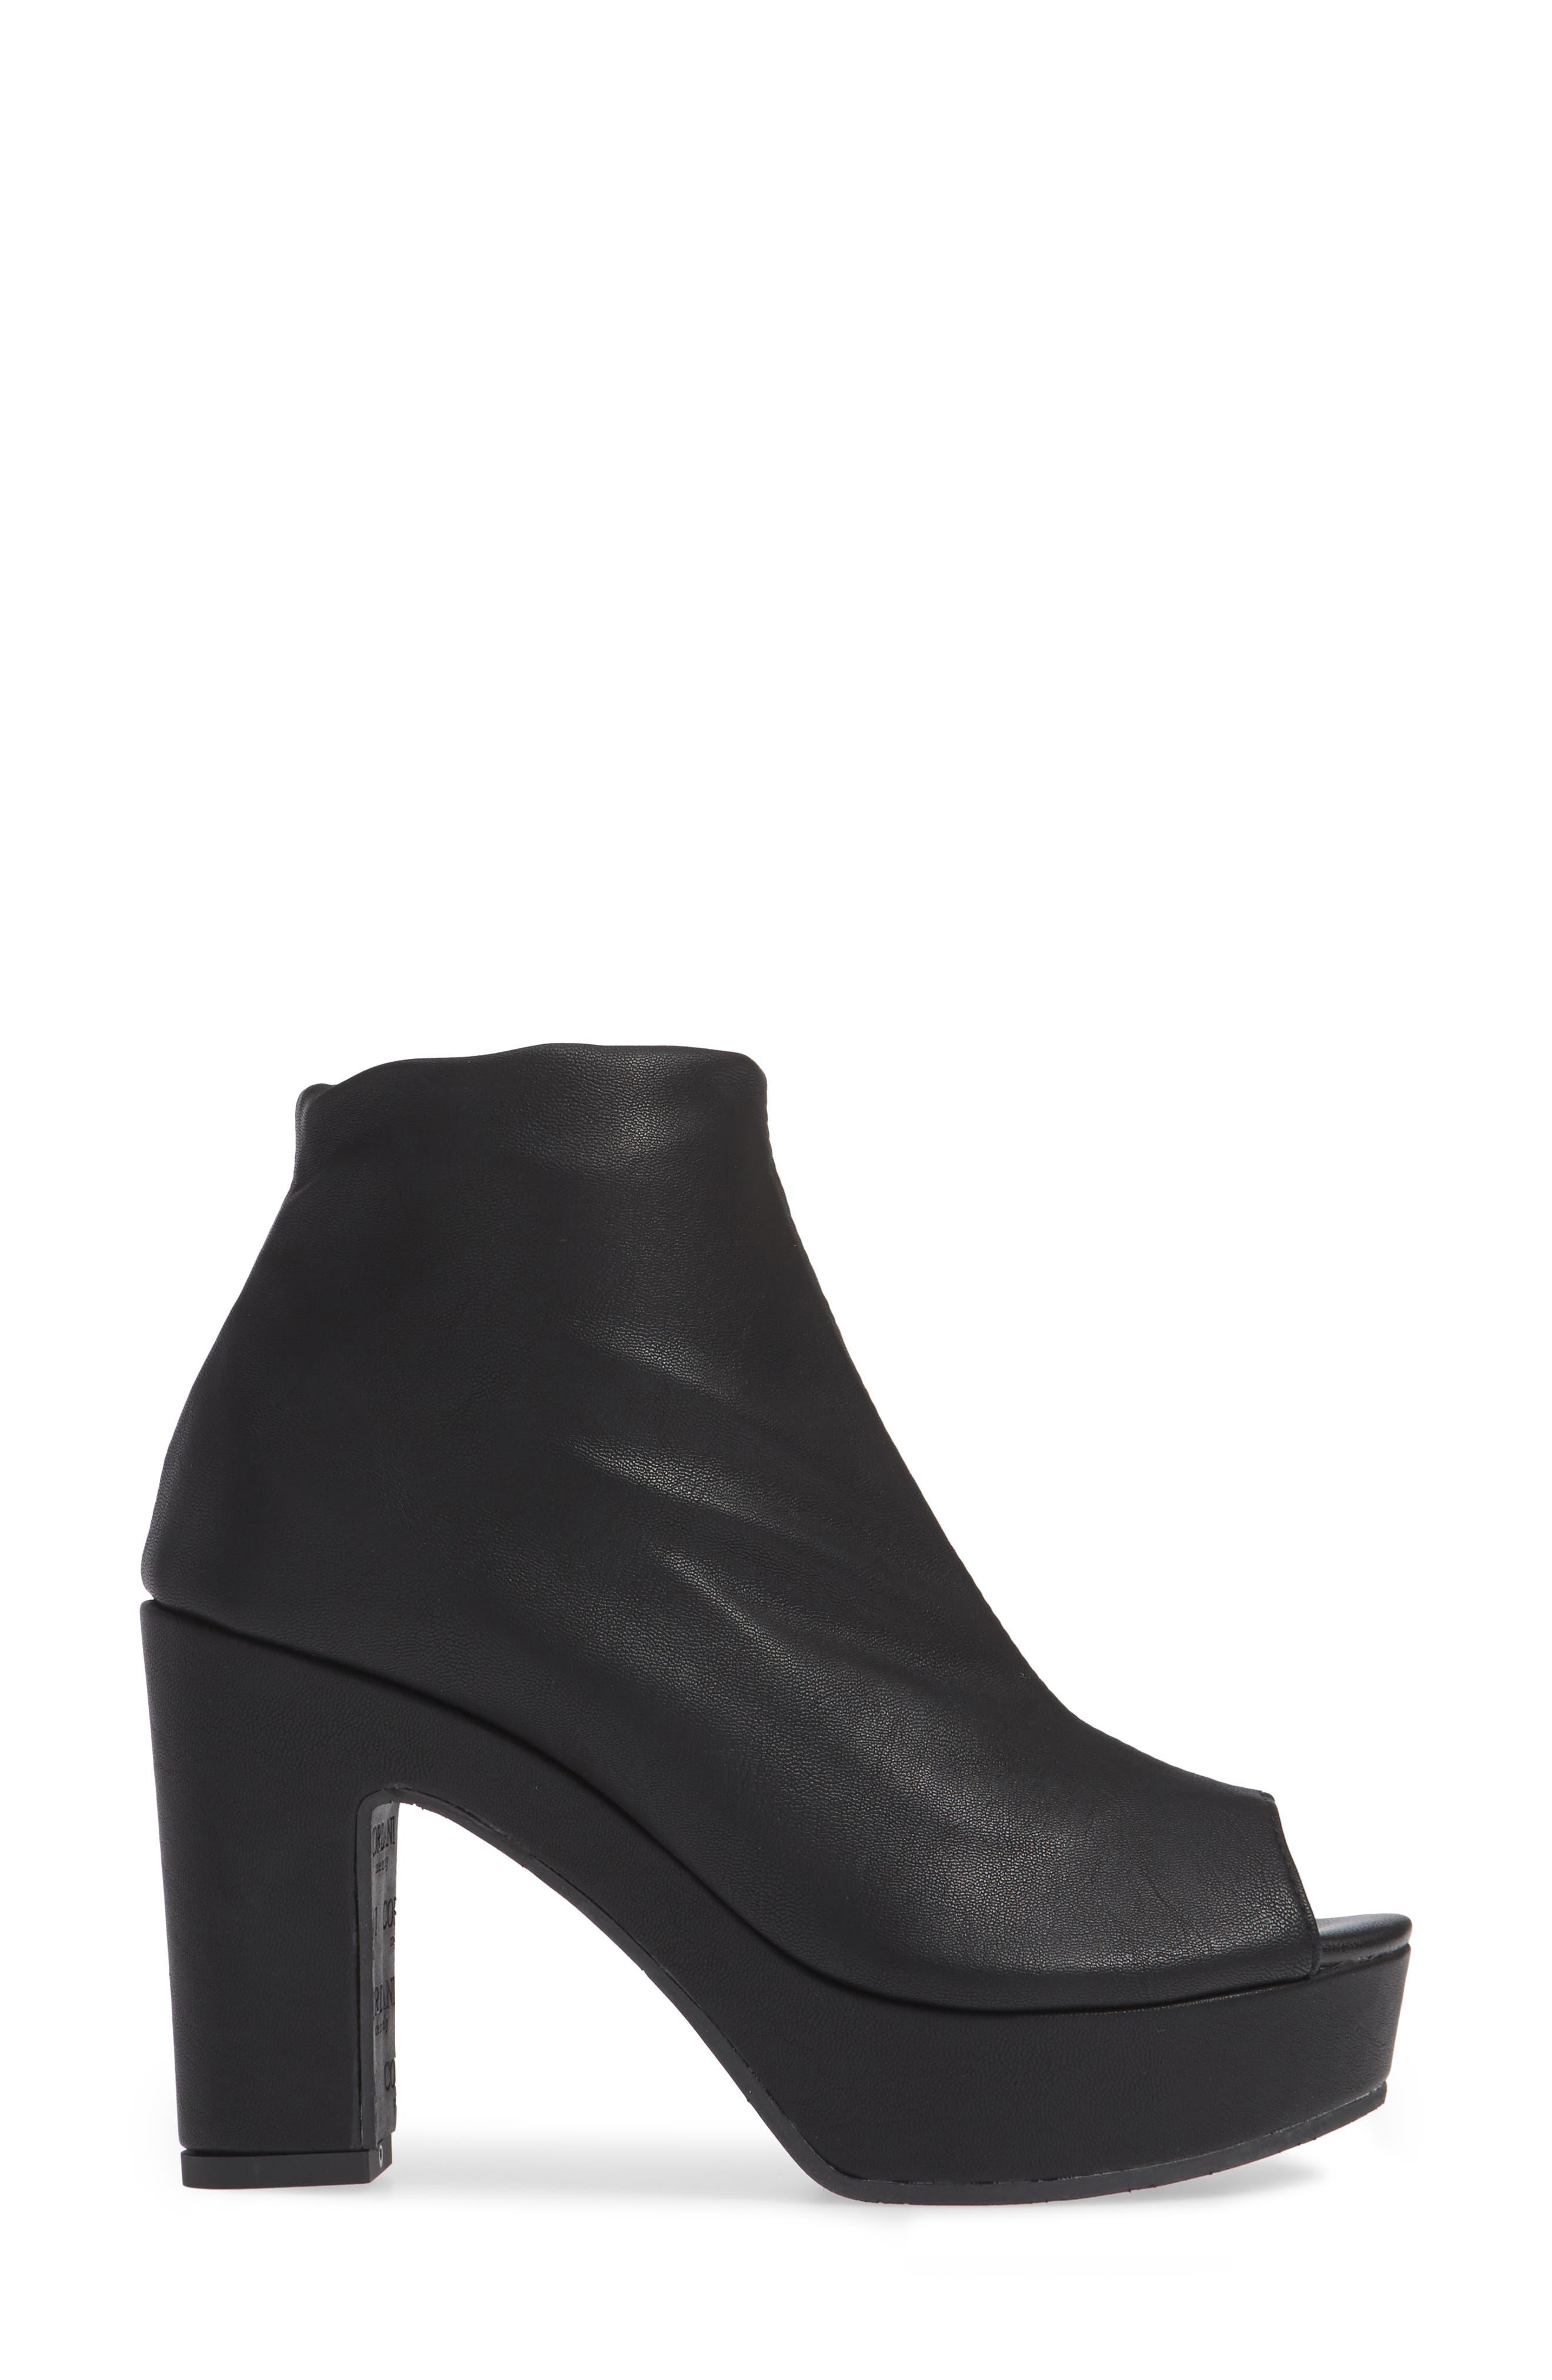 Tyra Peep Toe Platform Bootie,                             Alternate thumbnail 3, color,                             Black Fabric